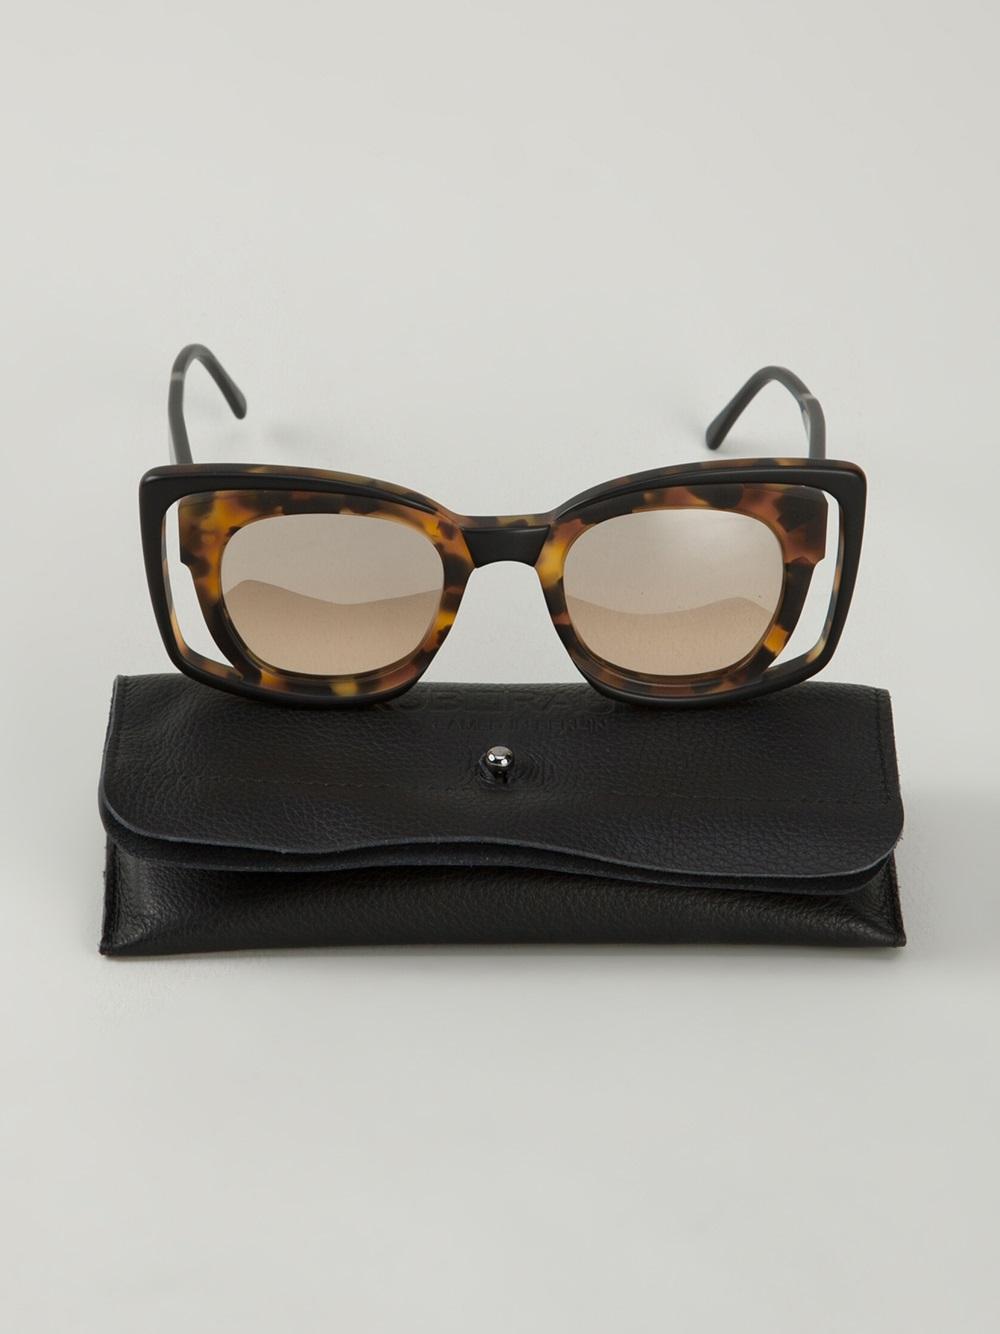 Kuboraum Mask T1 Sunglasses in Black